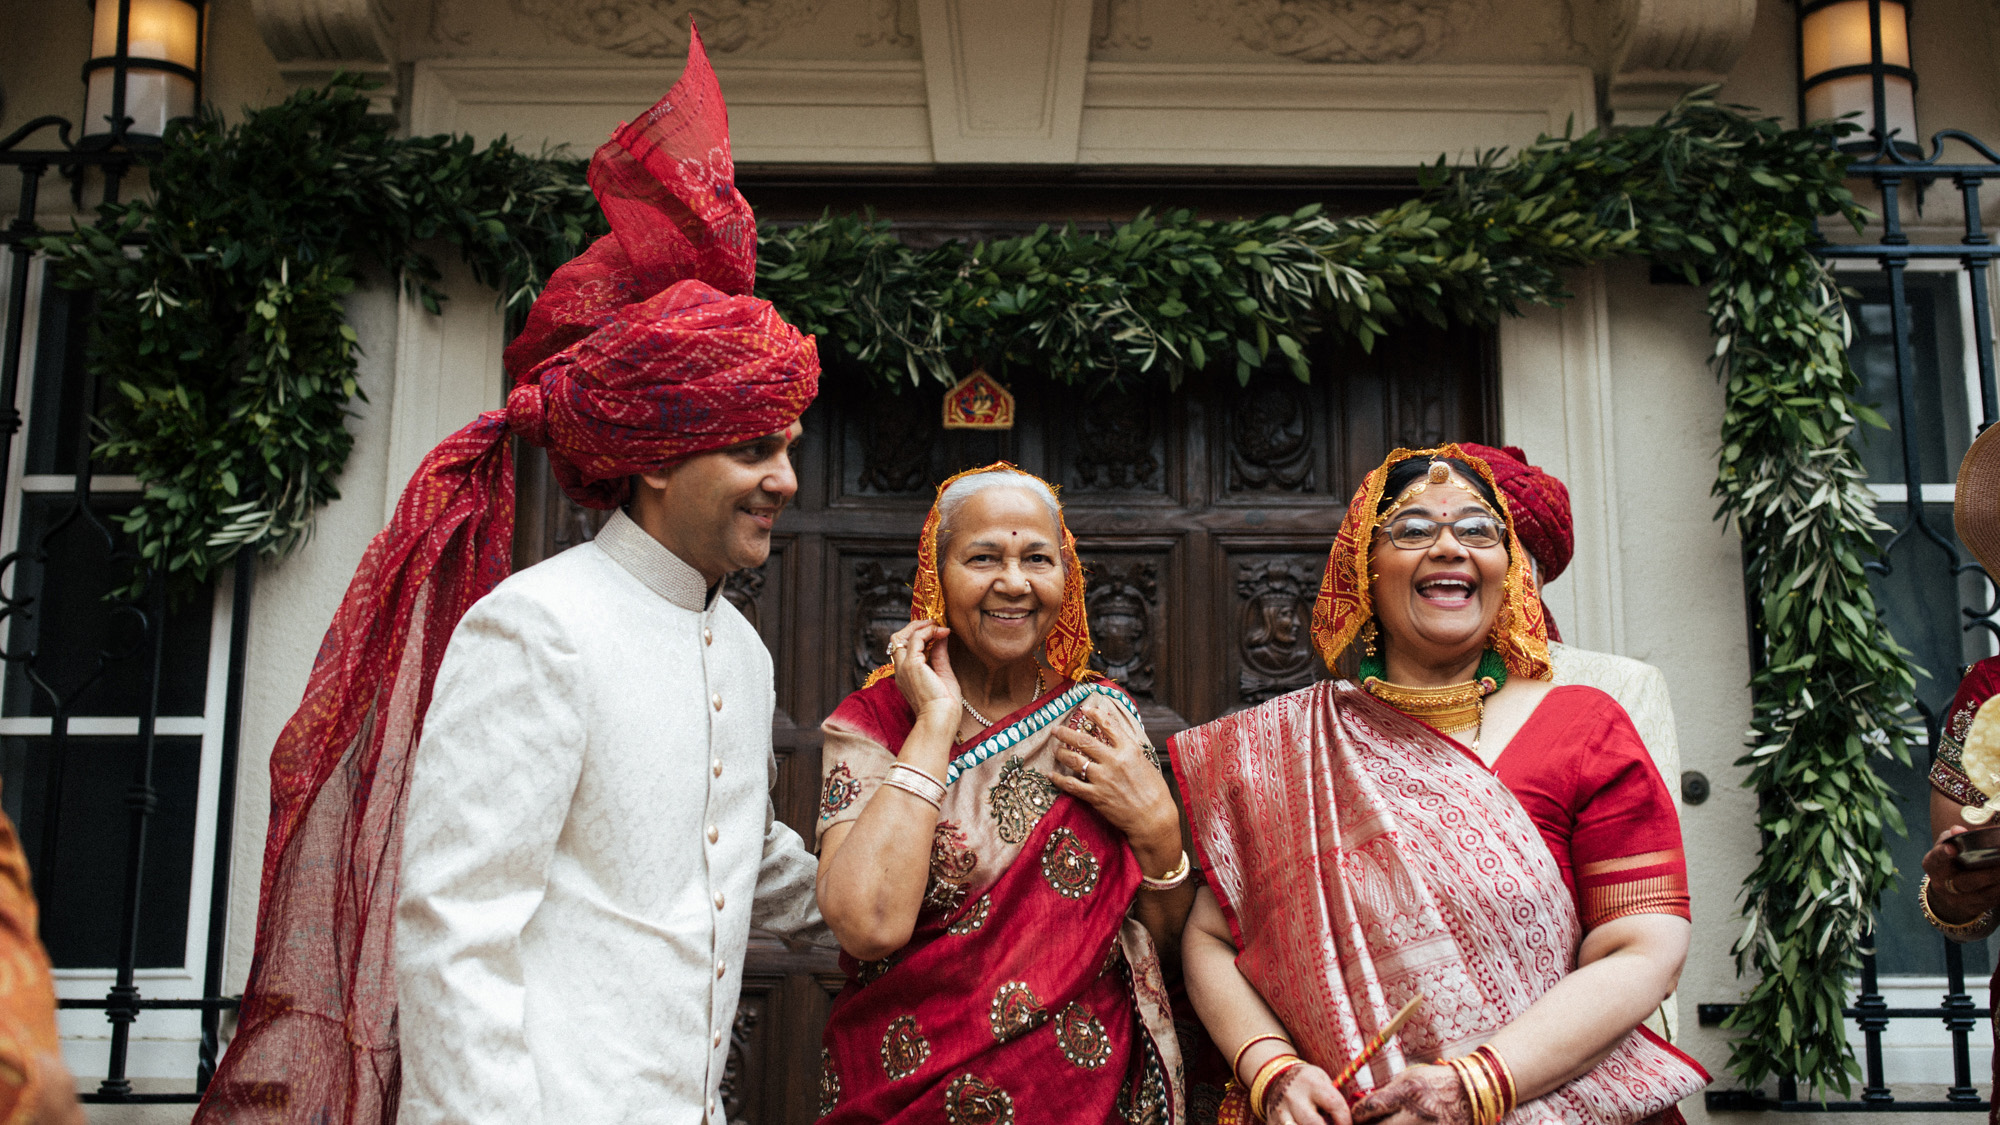 anu_maneesh_alec_vanderboom_Indian_wedding_photography-0078.jpg